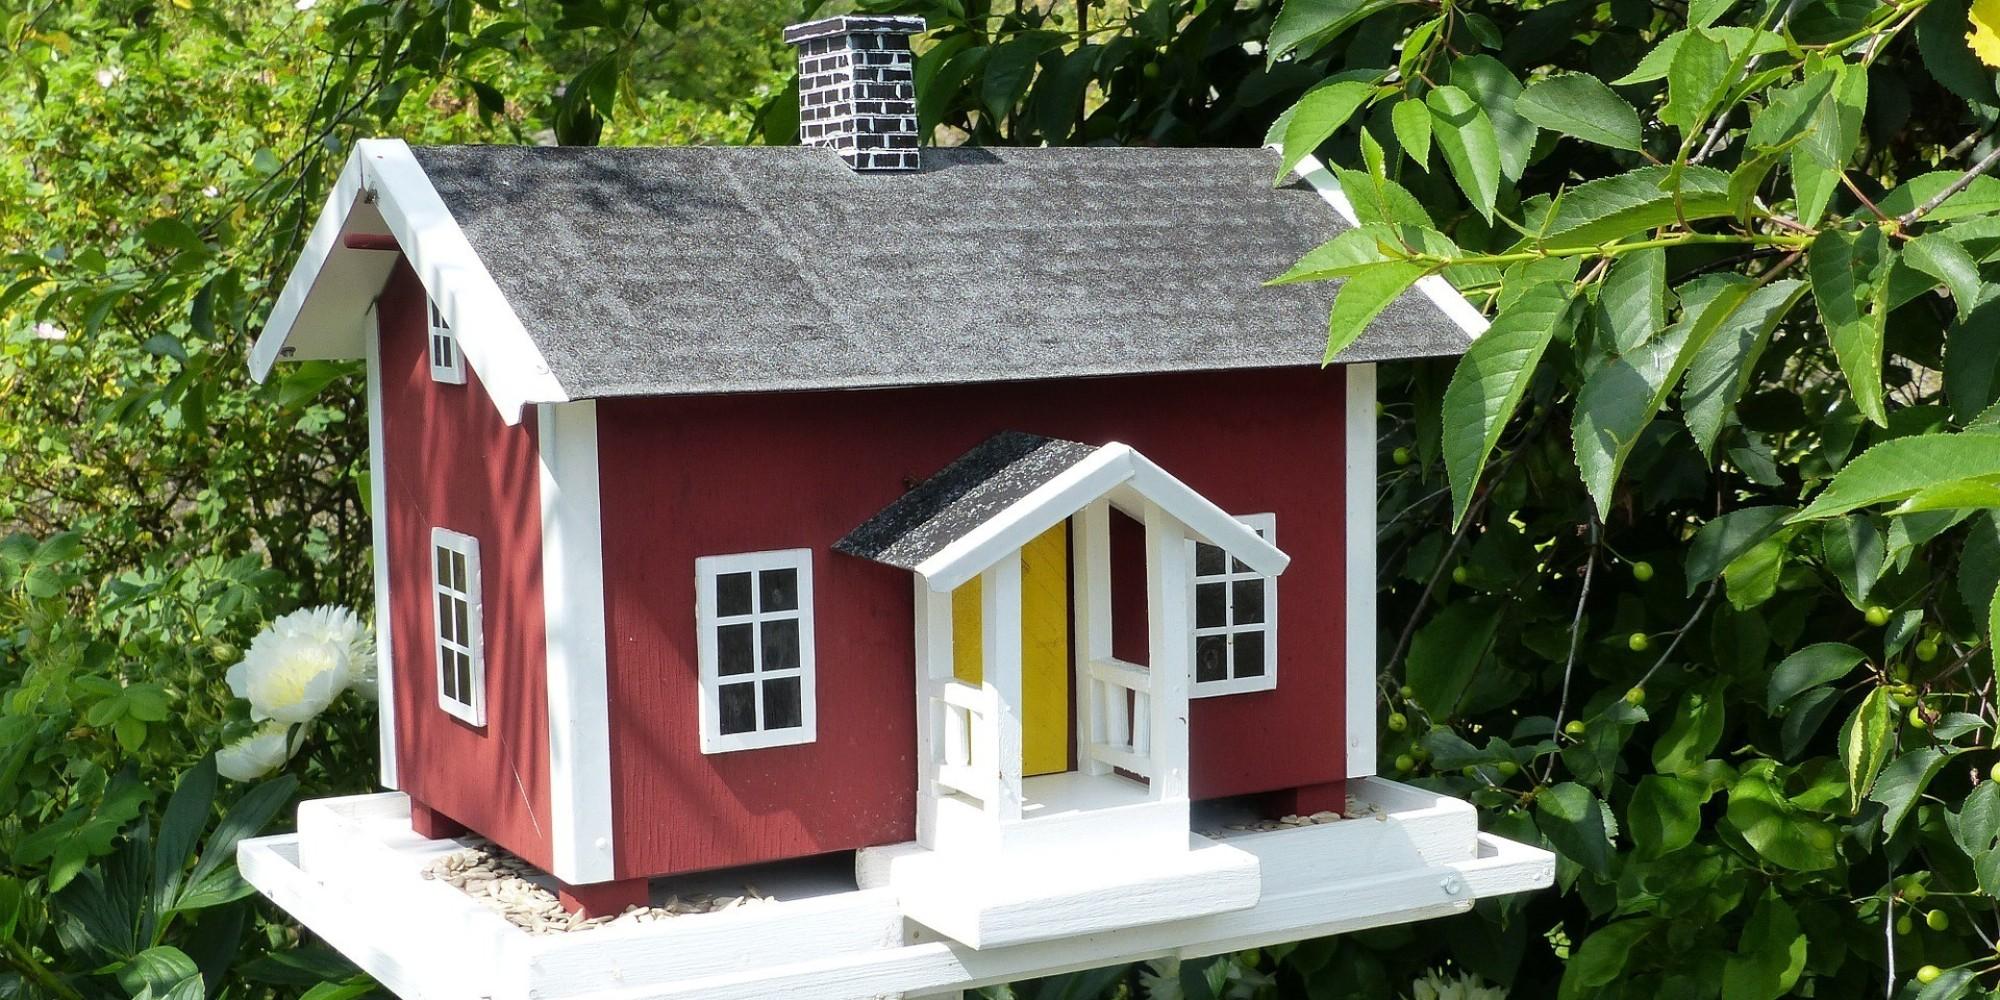 11 casas para p jaros hechas a partir de objetos viejos diy - Casa para pajaros ...